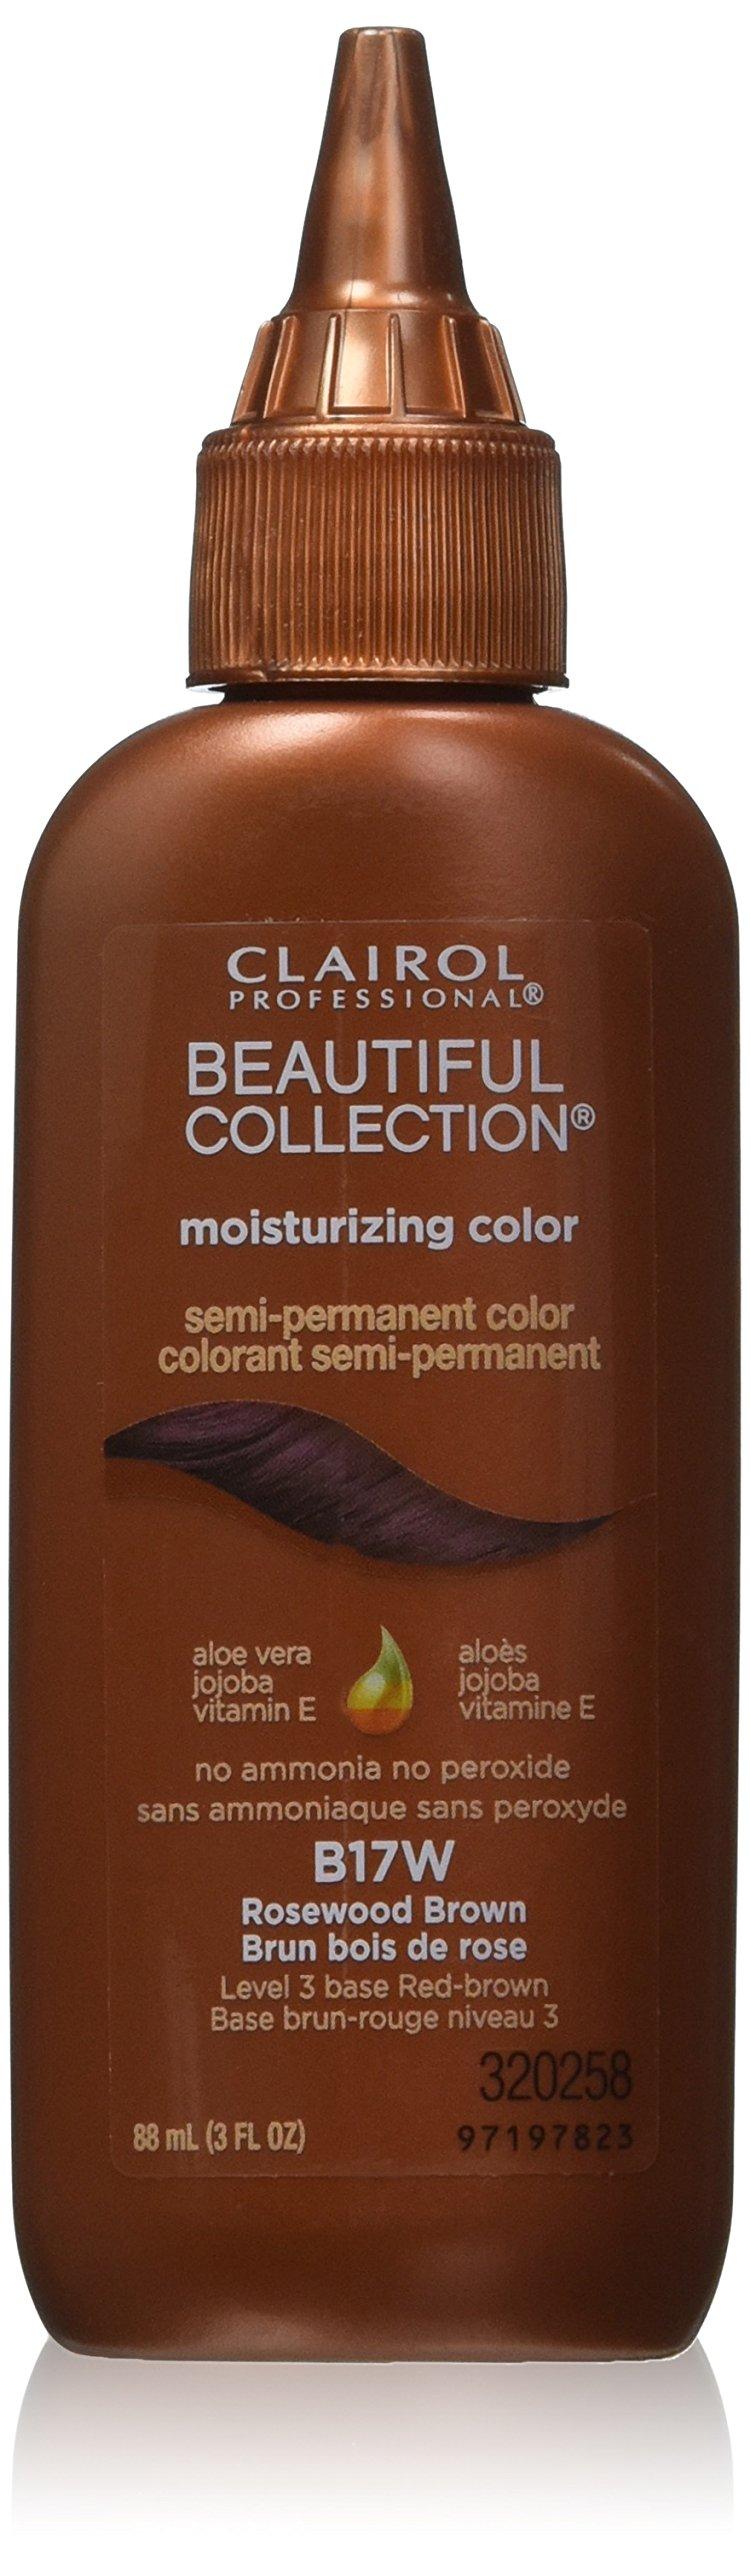 Amazon Clairol Professional 17w Rosewood Brown Moisturizing